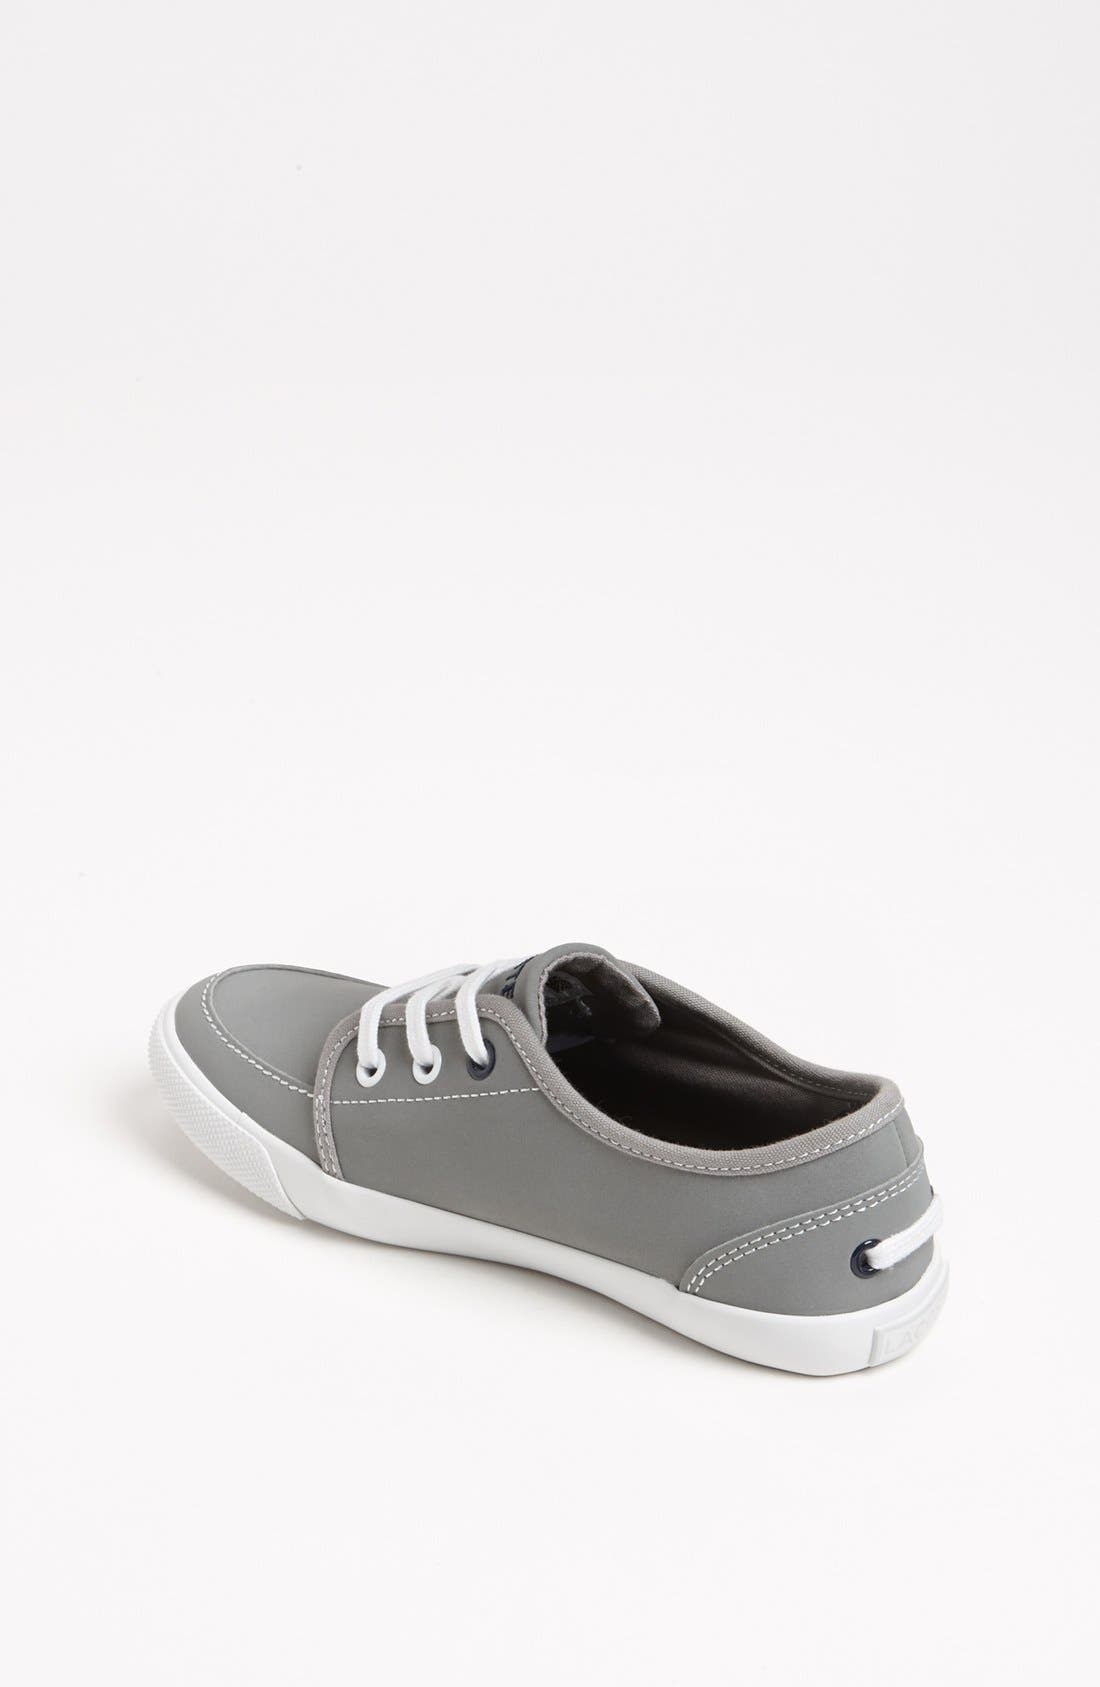 Alternate Image 2  - Lacoste 'Boat DE' Sneaker (Toddler & Little Kid)